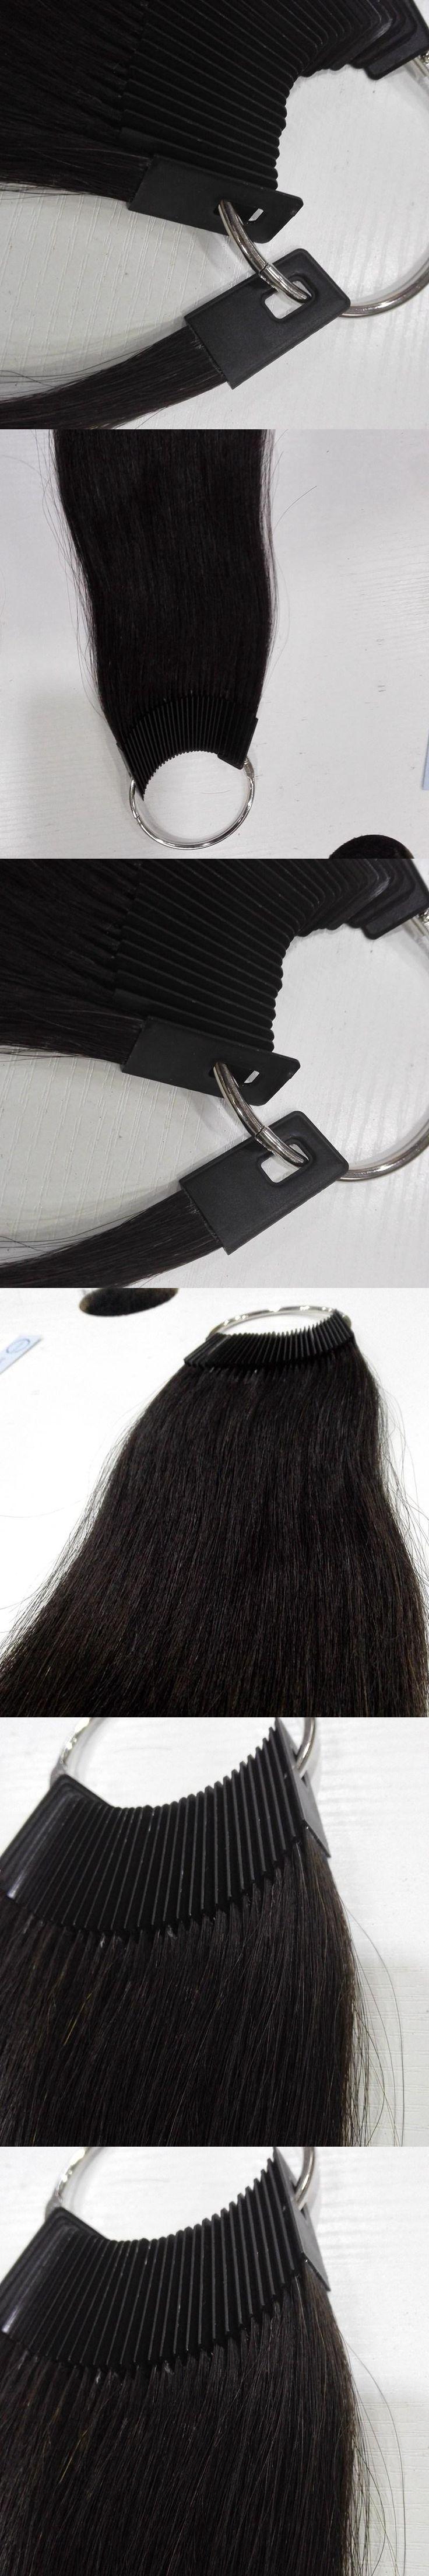 8 inch human hair color ring 30pcs/set for salon hair  color chart natural 3colo/lot